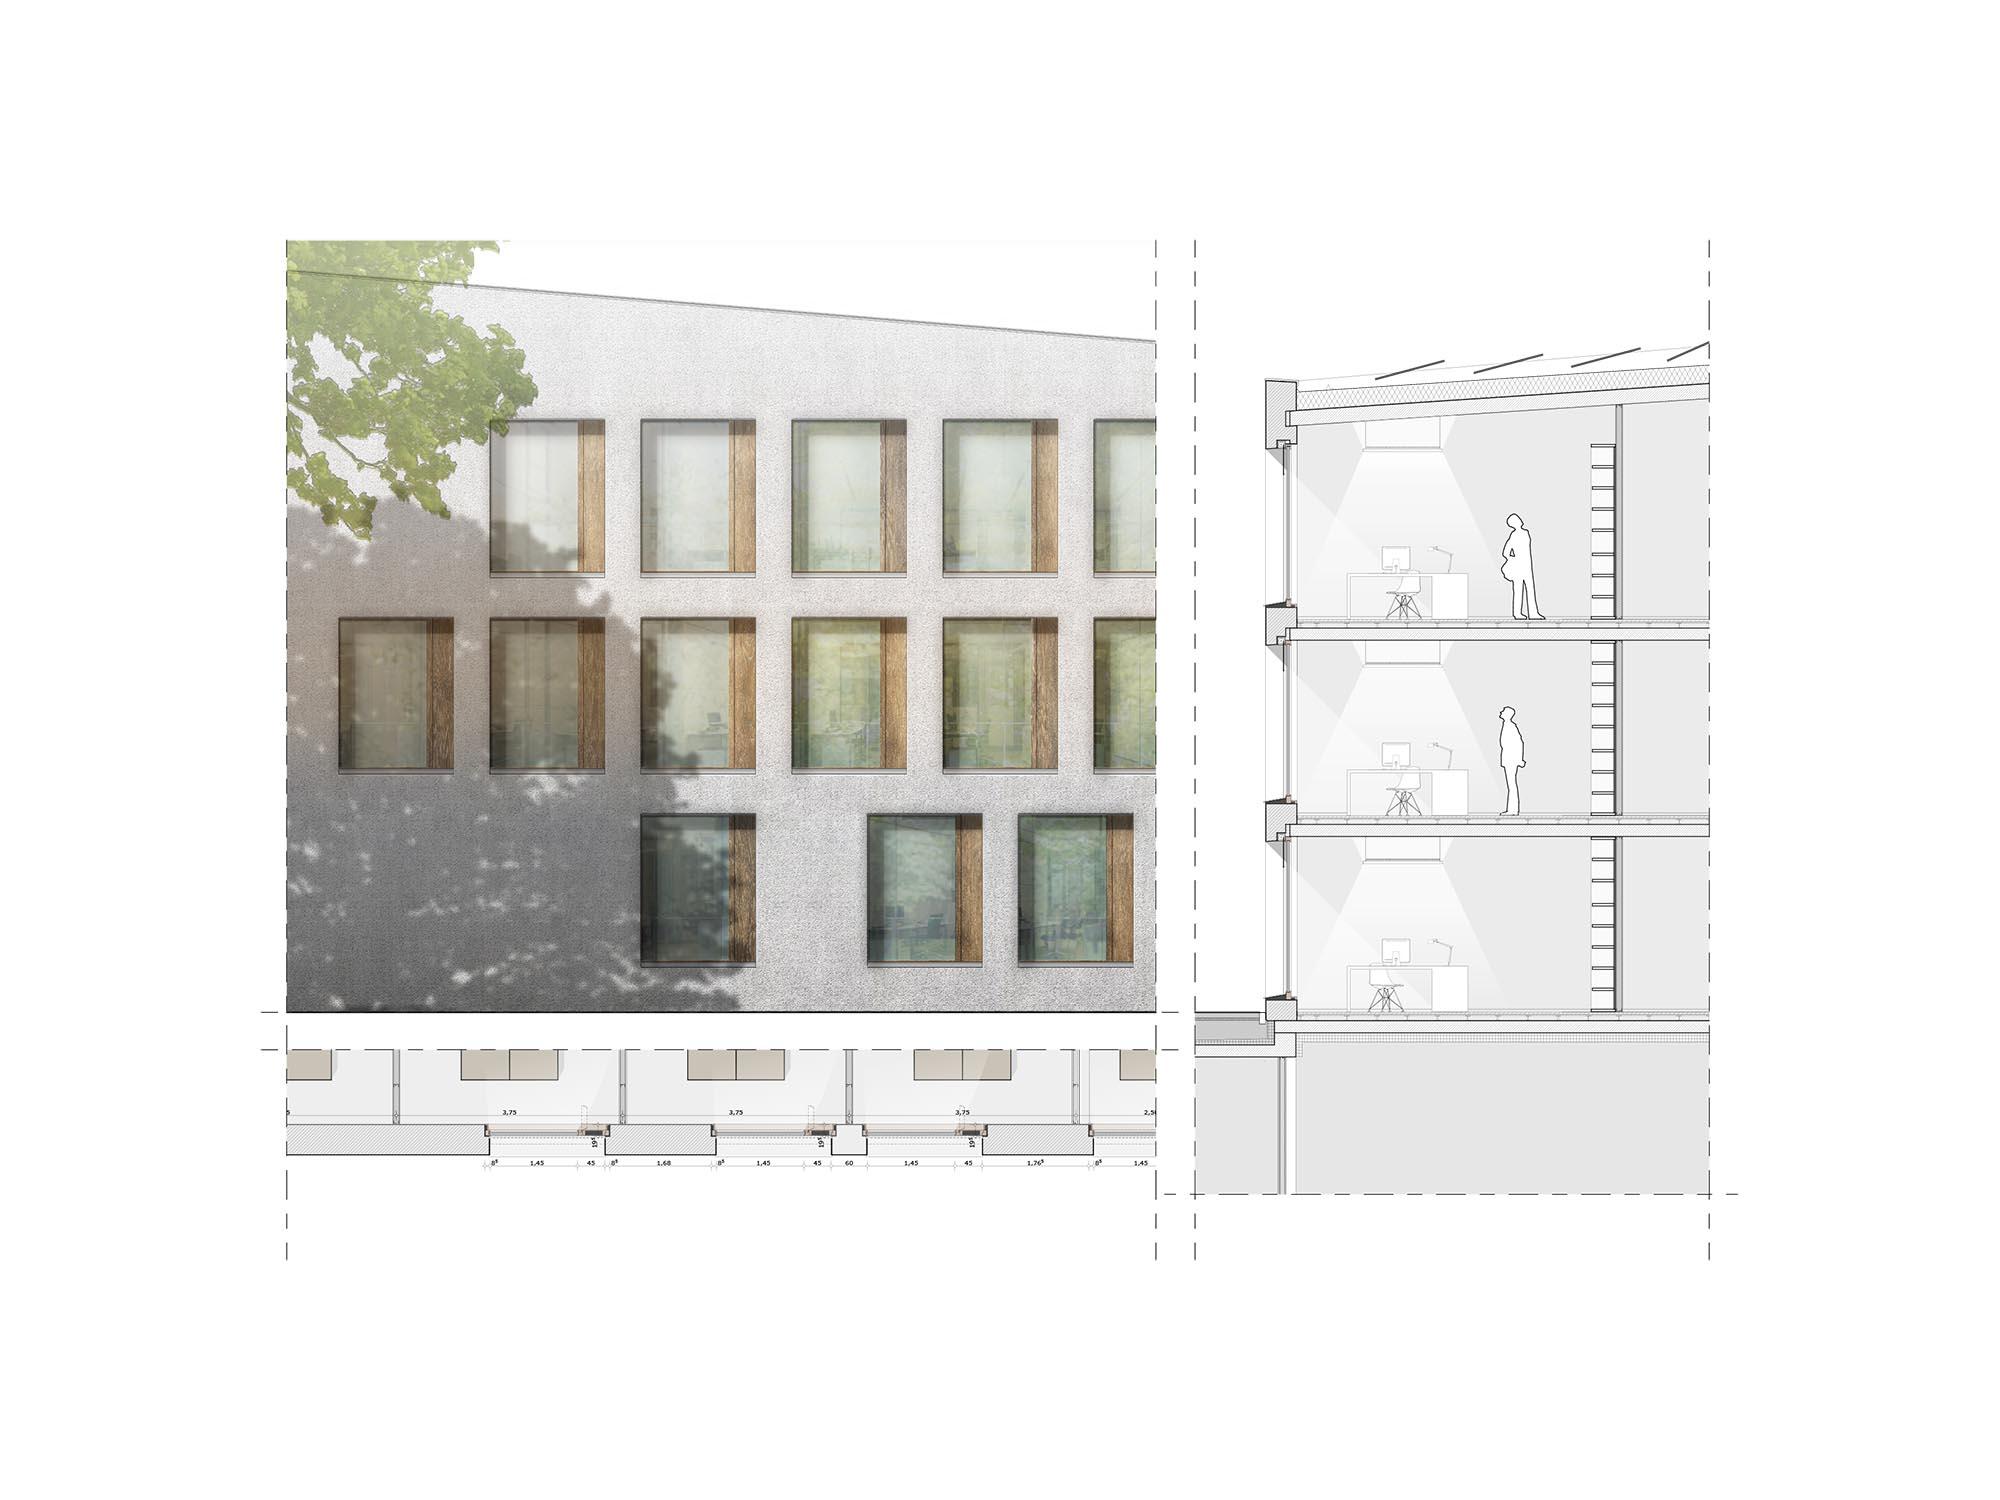 Bürgerzentrum Neubiberg 2022